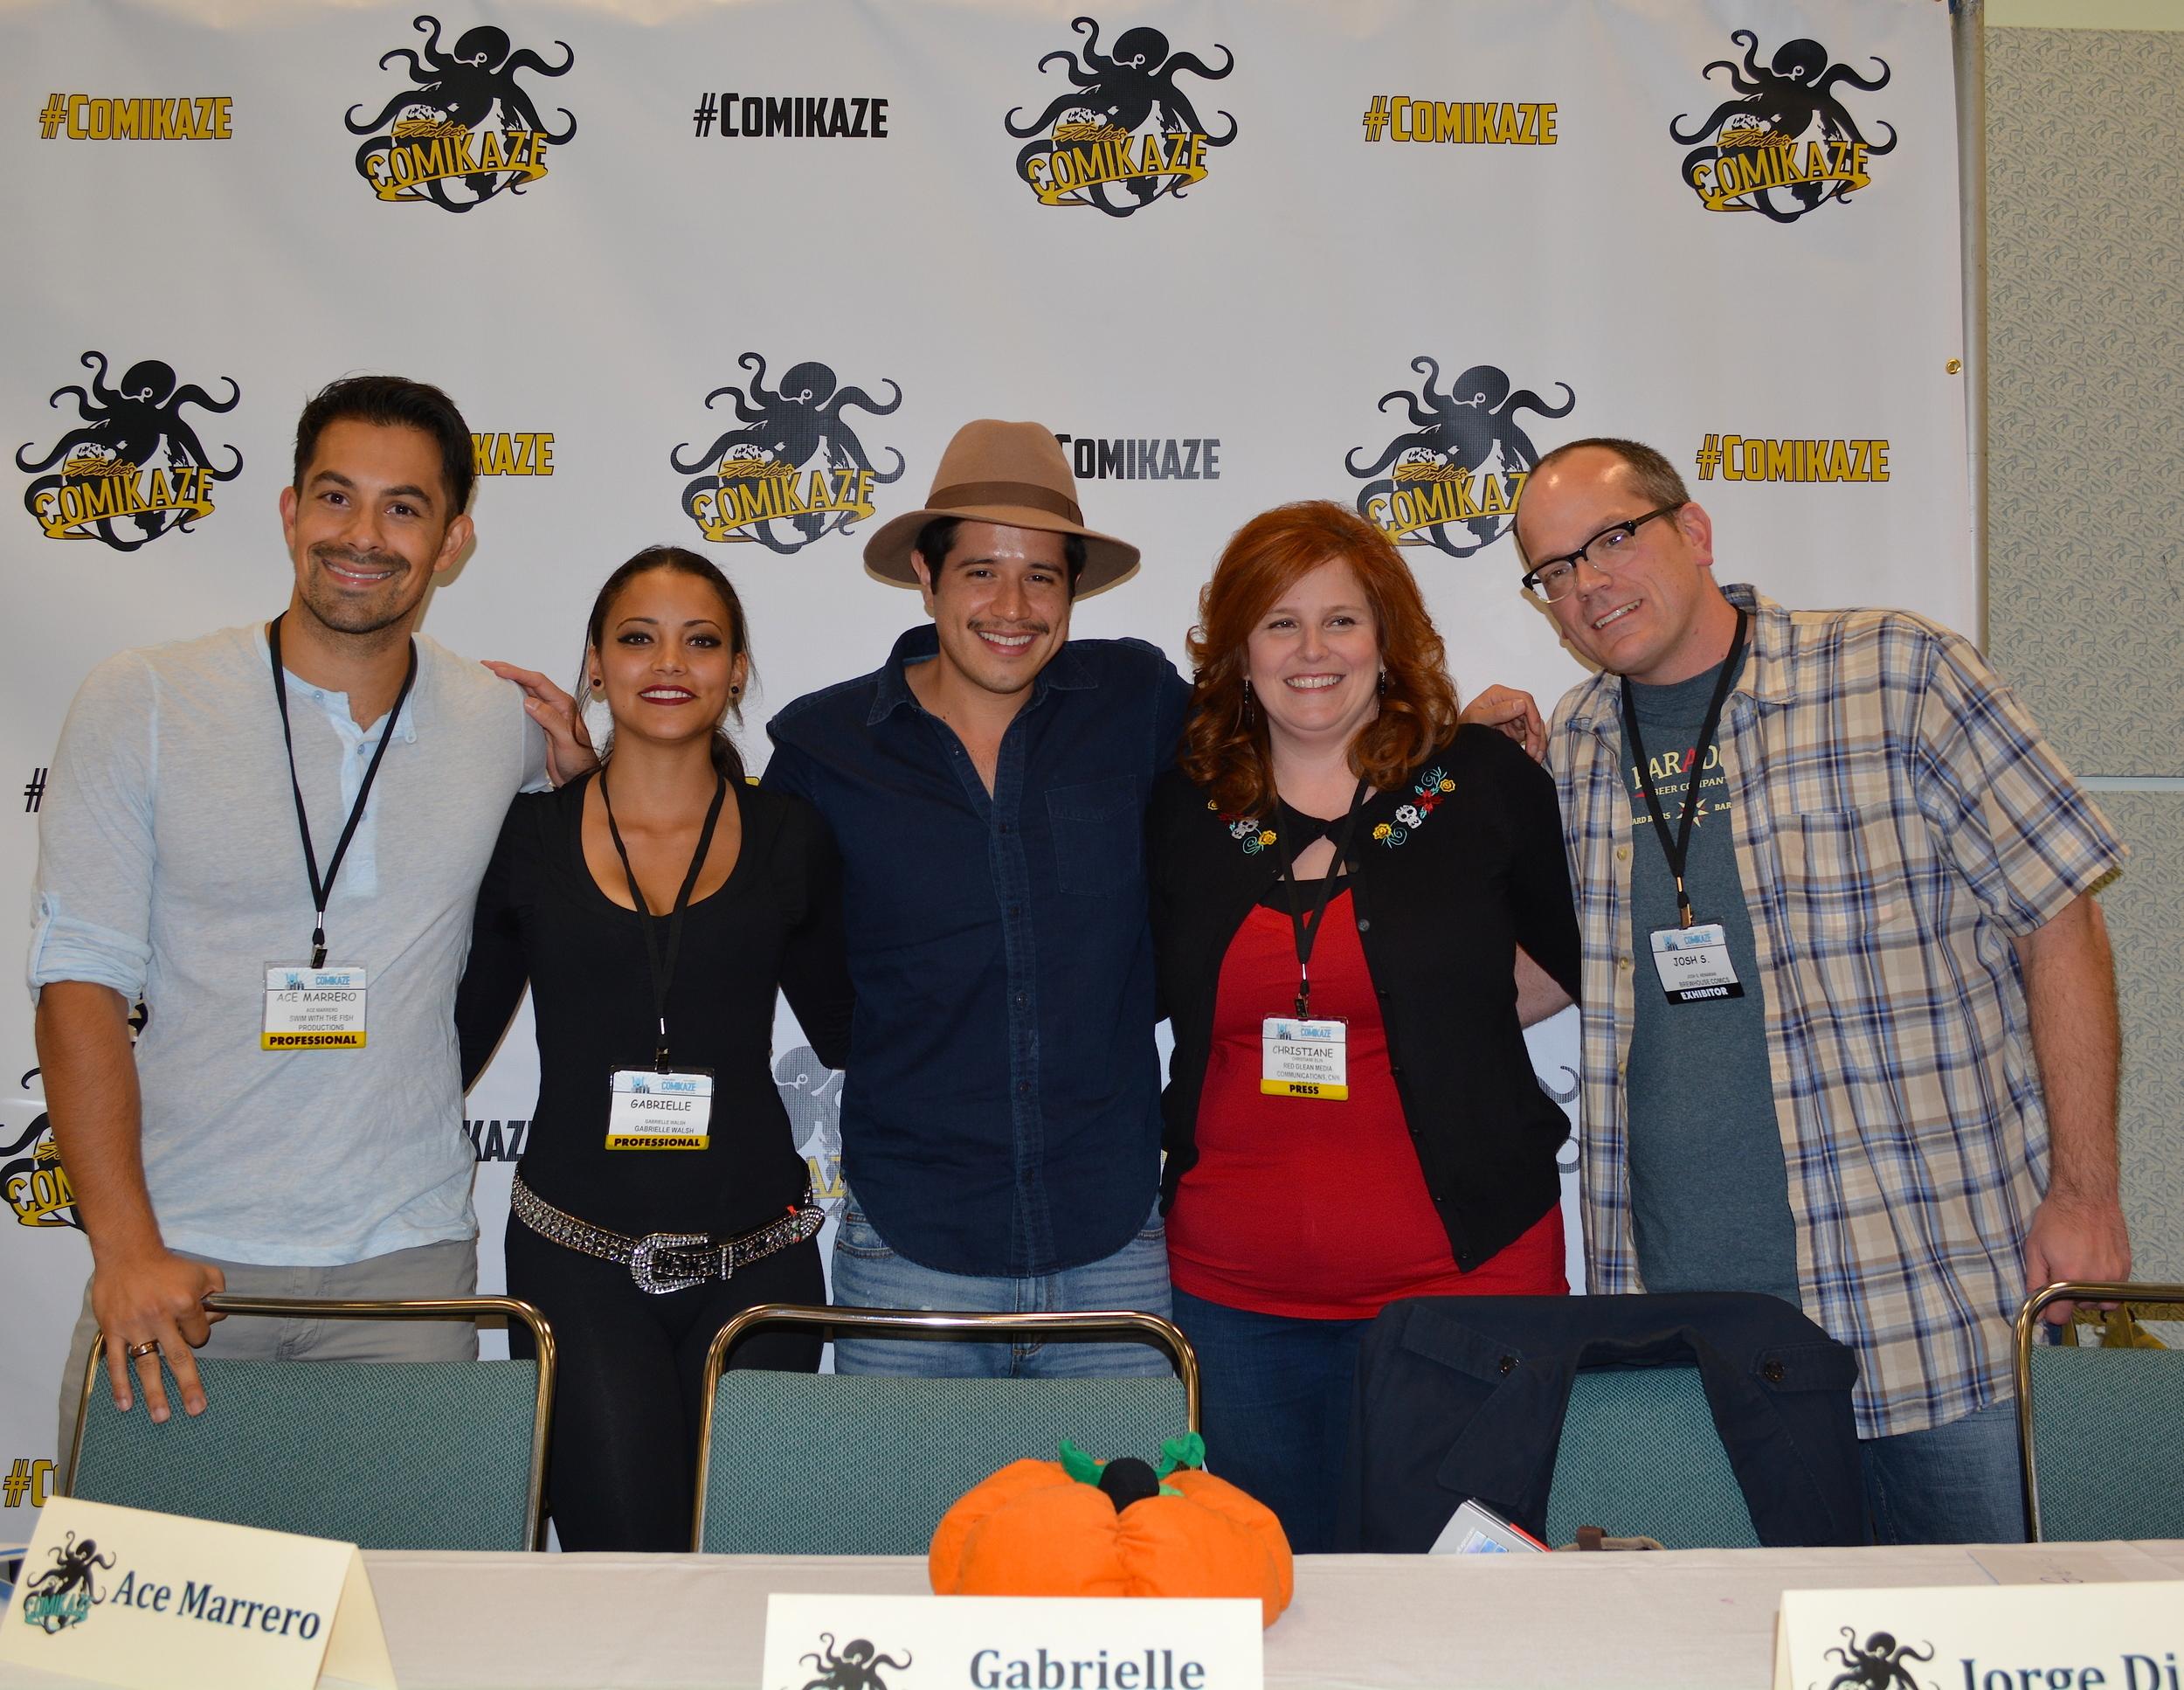 Horror Panel on Friday. From left to right: Ace Marrero, Gabriella Waljs, Jorge Diaz, Christiane Elin, Josh Henaman.